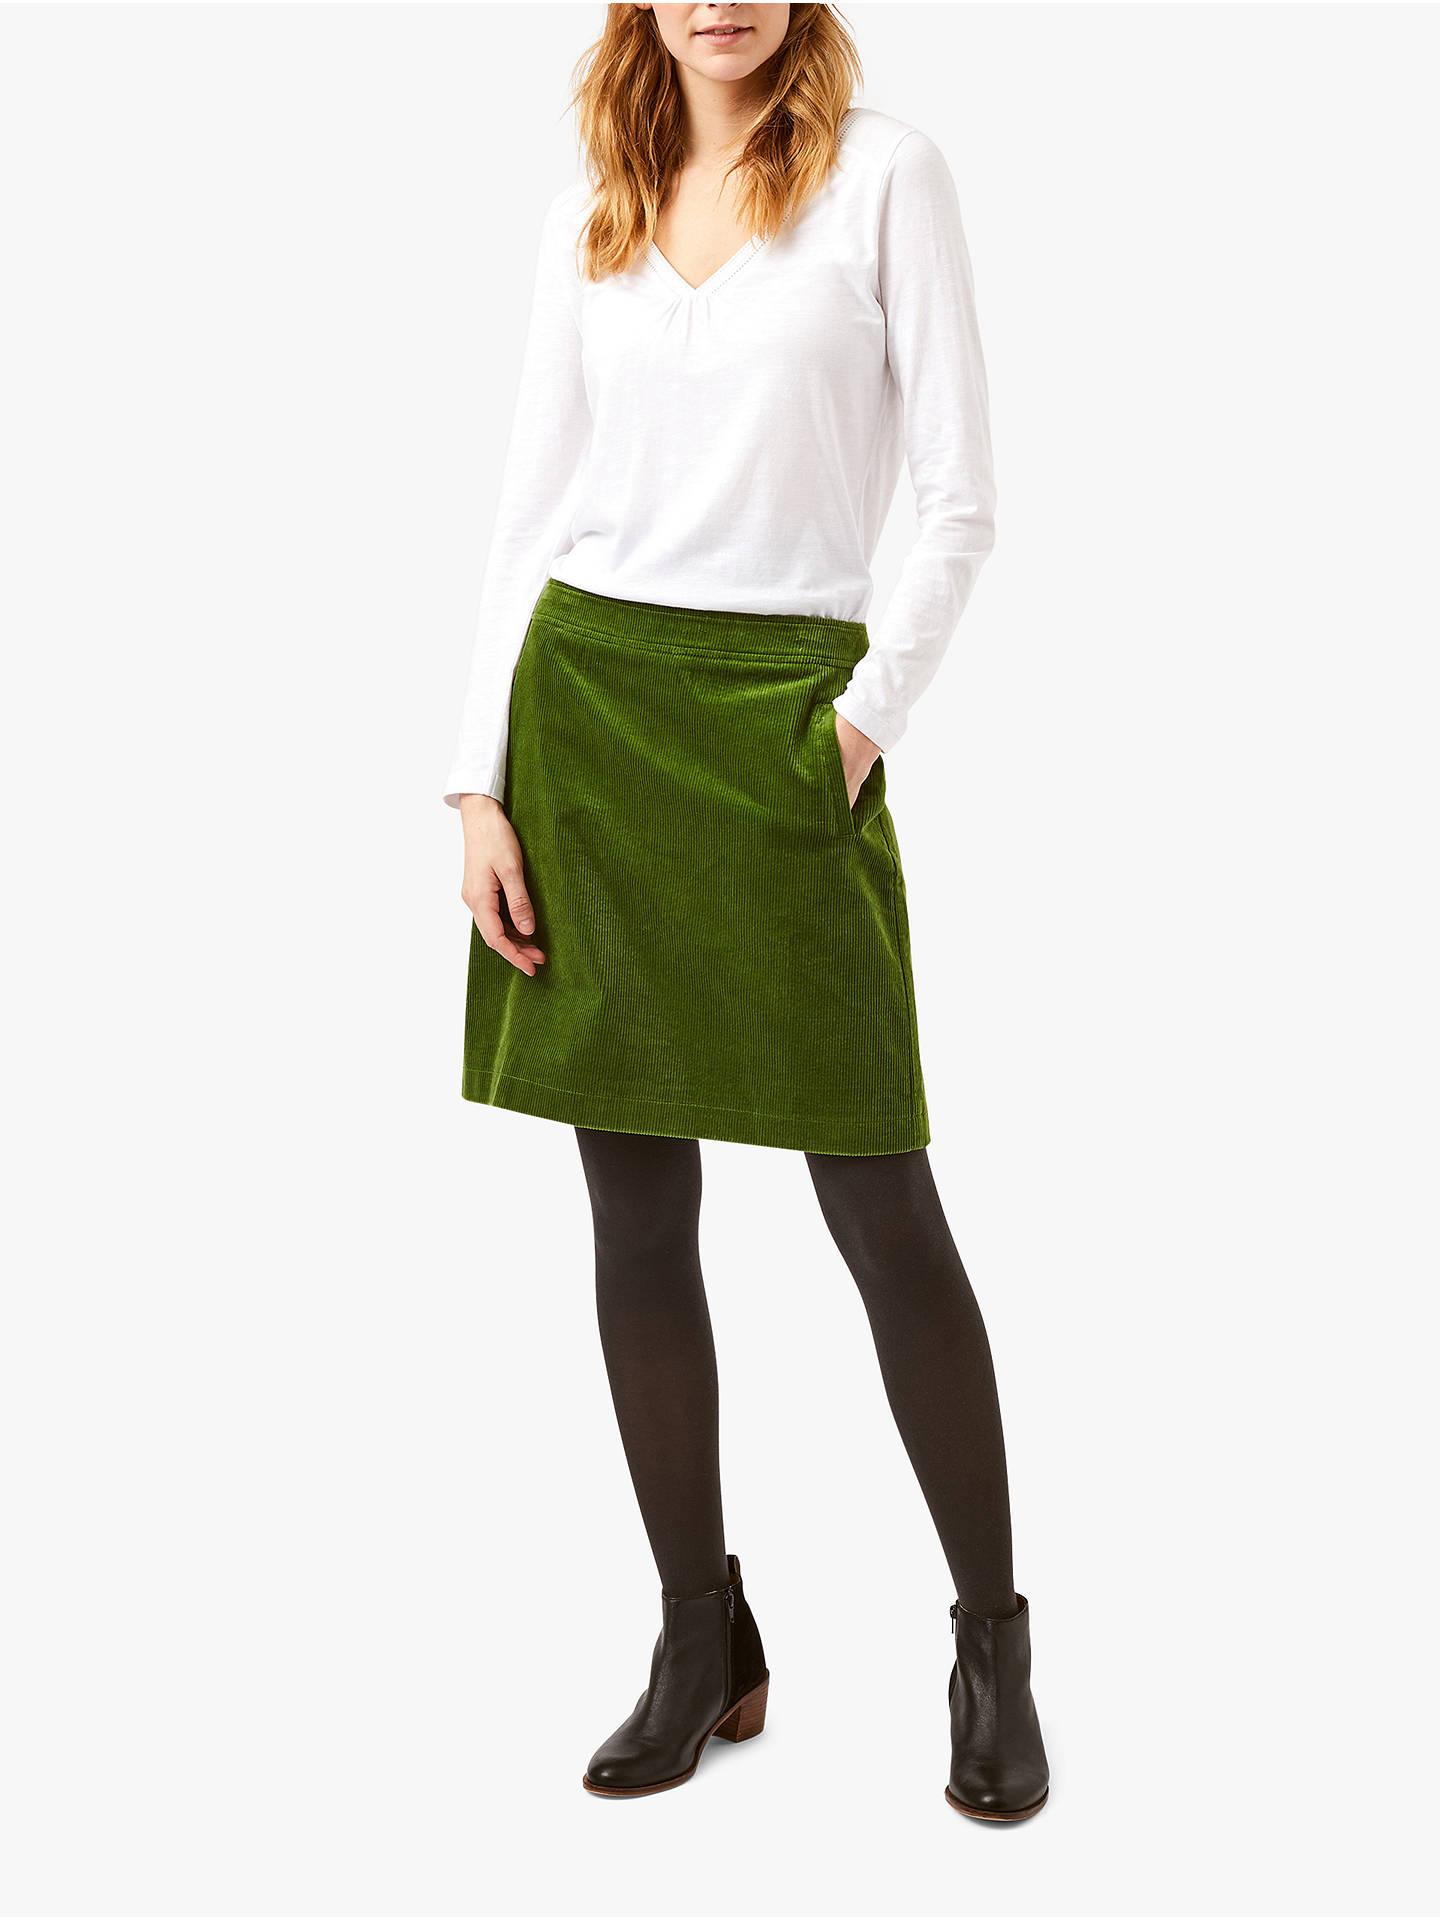 243d0da57072 Buy White Stuff Iris Cord A-Line Skirt, Green, 16 Online at johnlewis ...